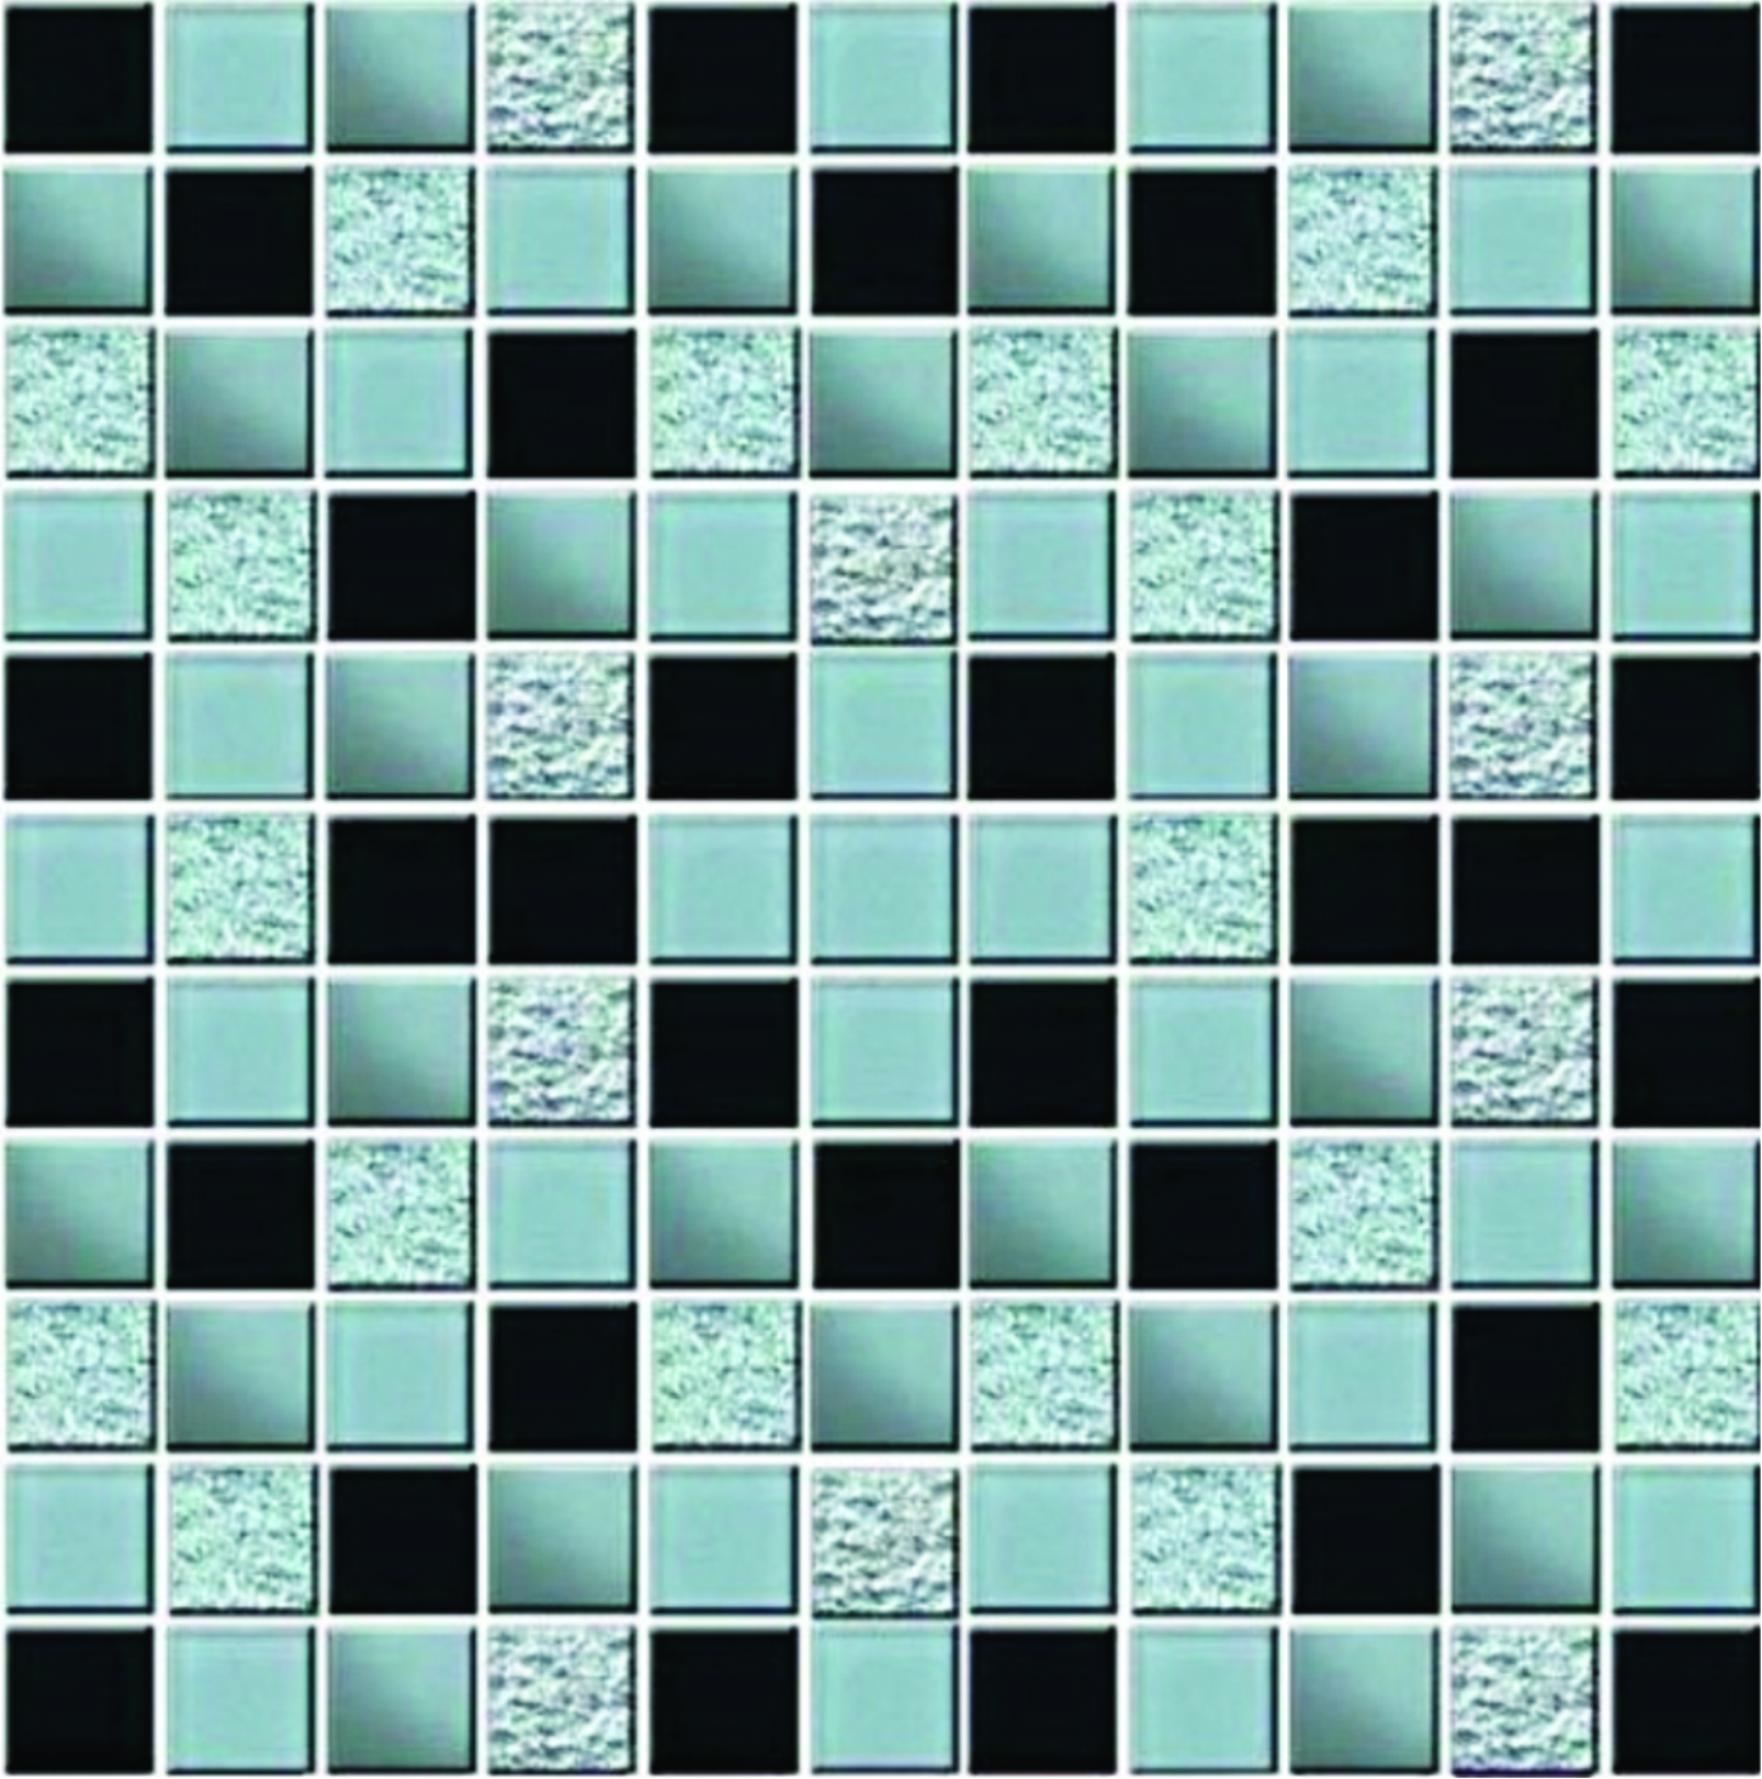 Adesivo Decorativo Azulejo pastilha 6  Adesi Color  Elo7 -> Banheiro Com Azulejo Que Imita Pastilha